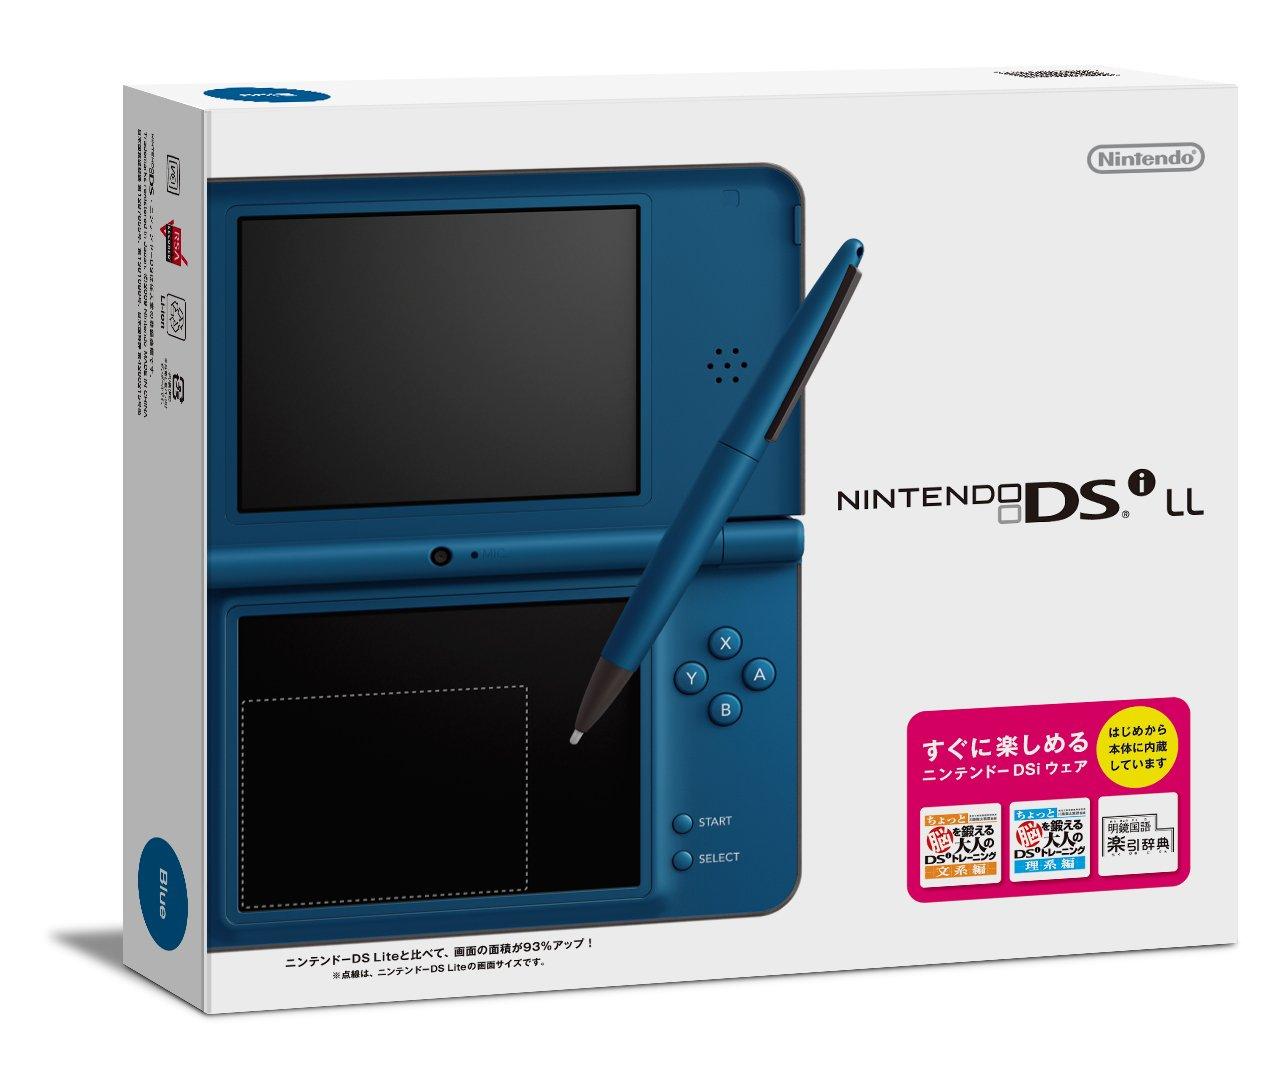 Nintendo Dsi Ll Blue